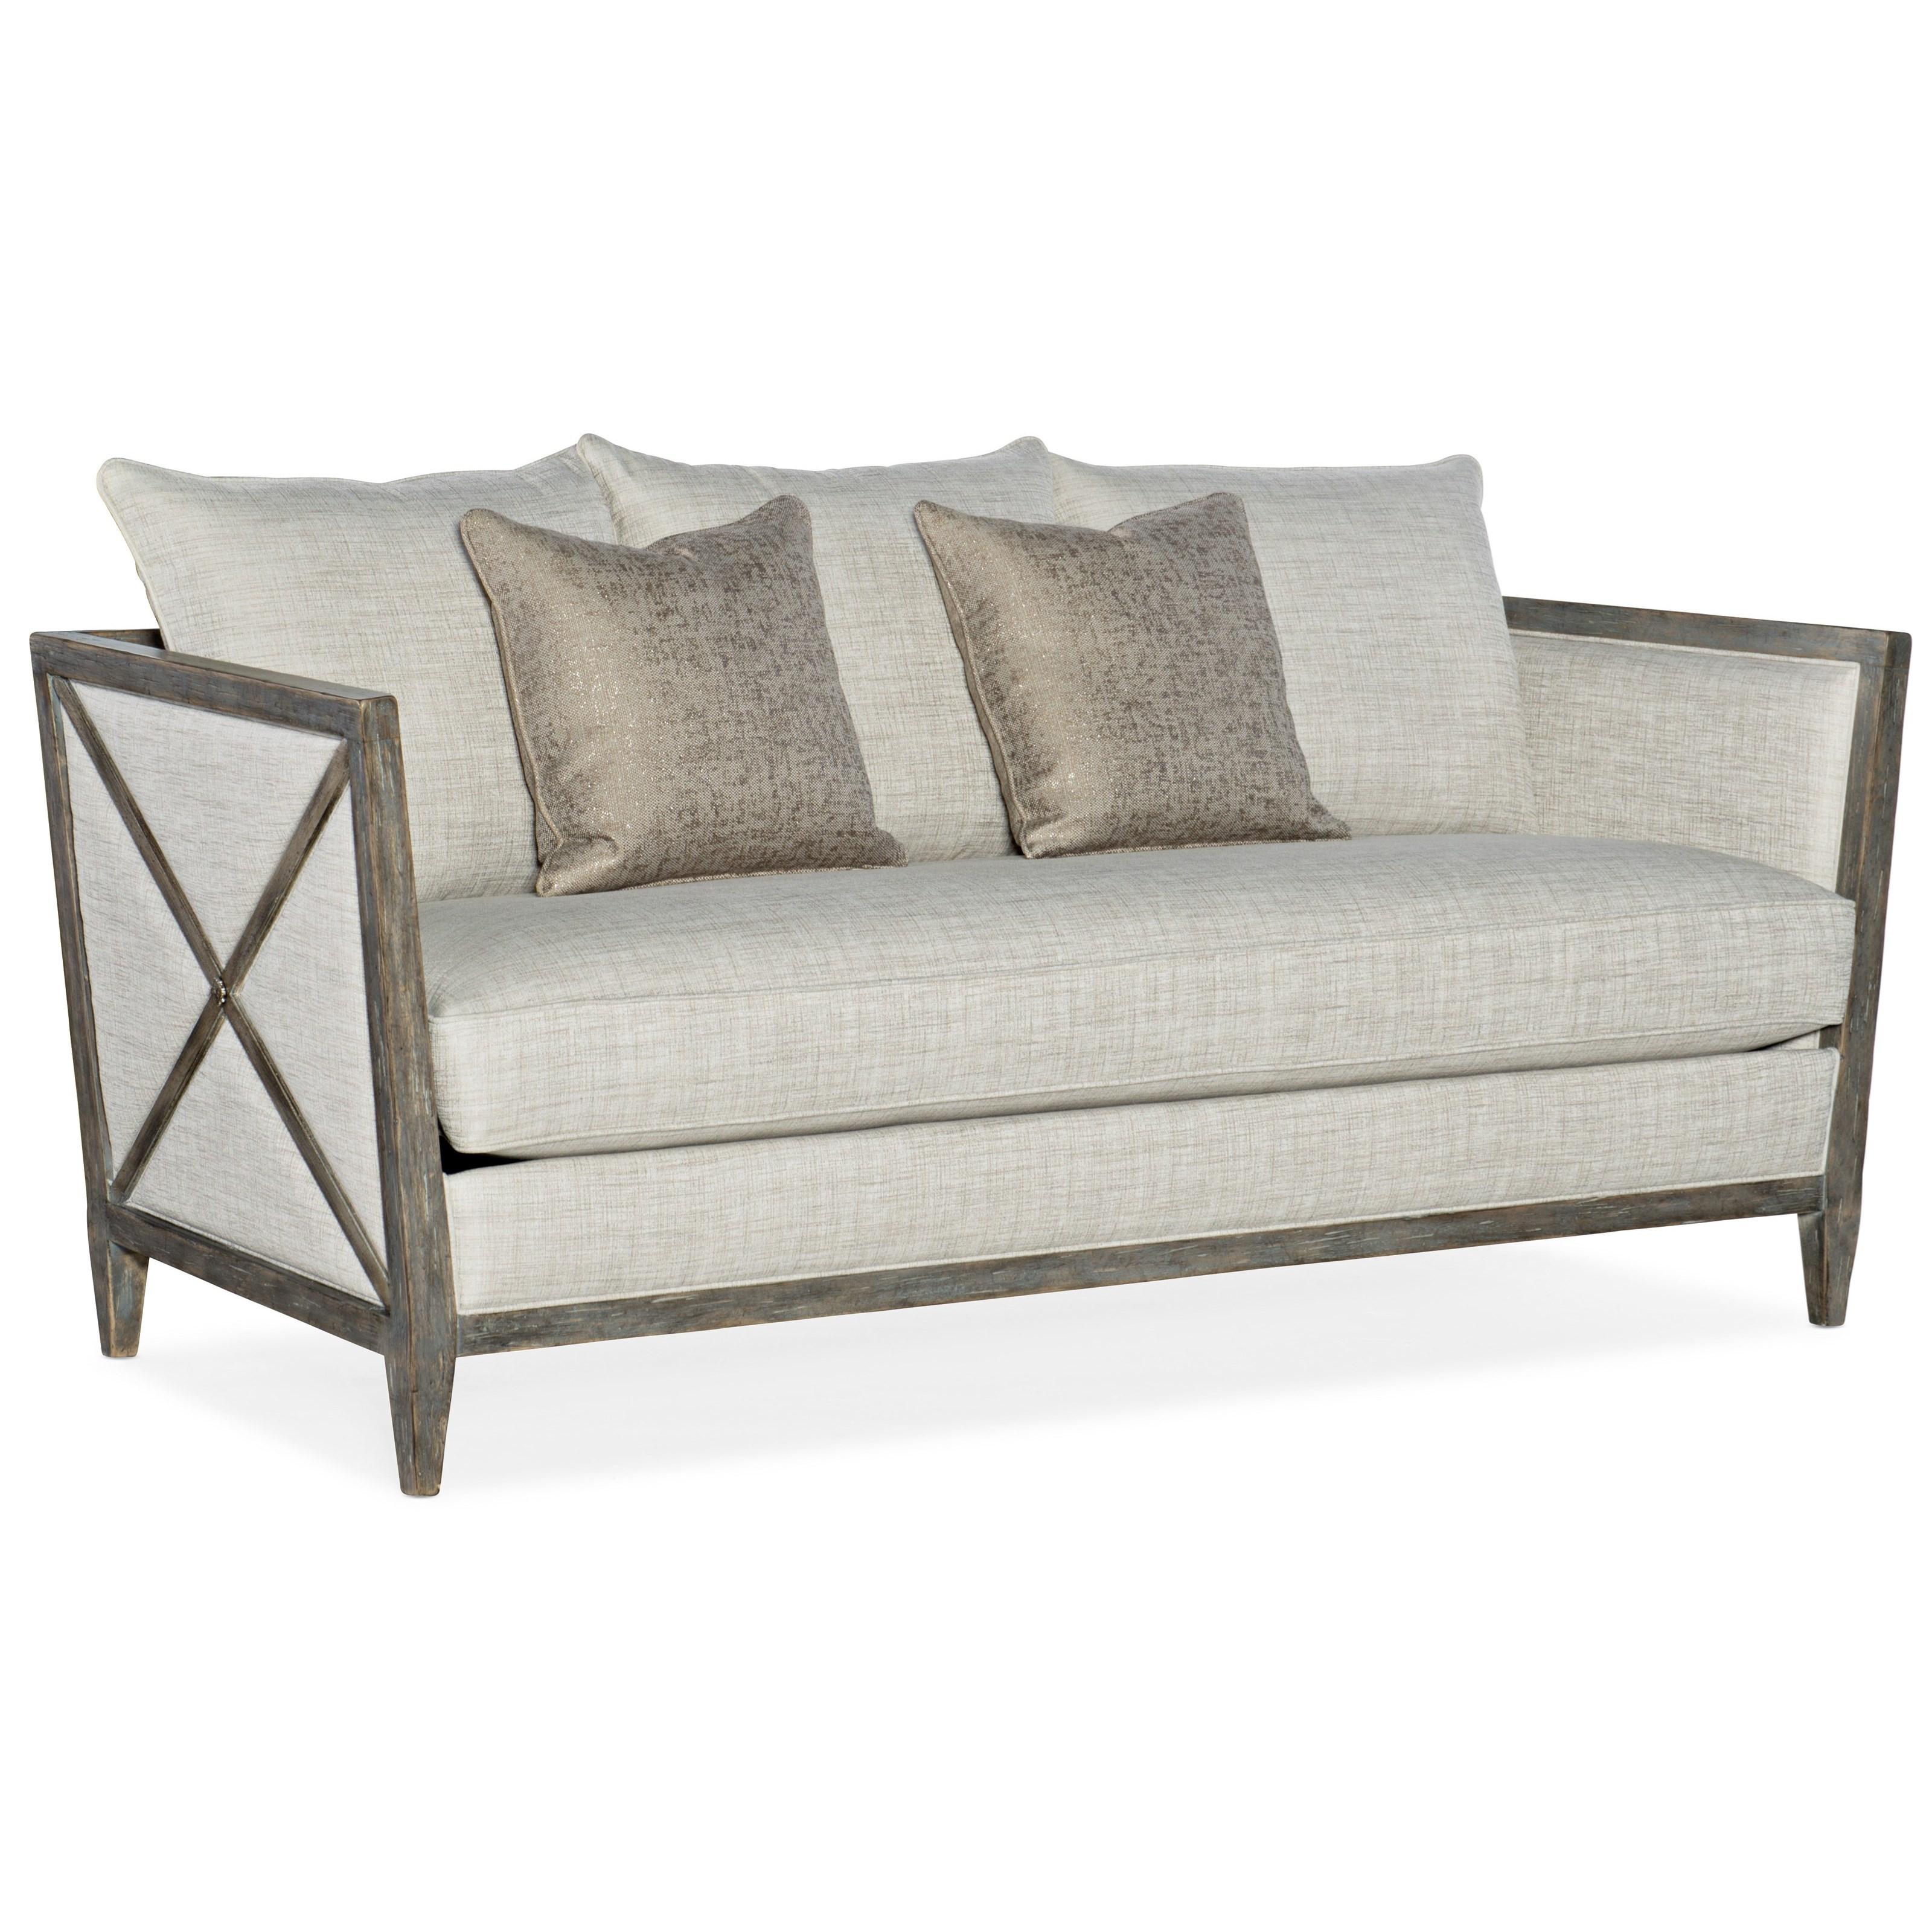 Sanctuary Proper Sofa by Hooker Furniture at Baer's Furniture